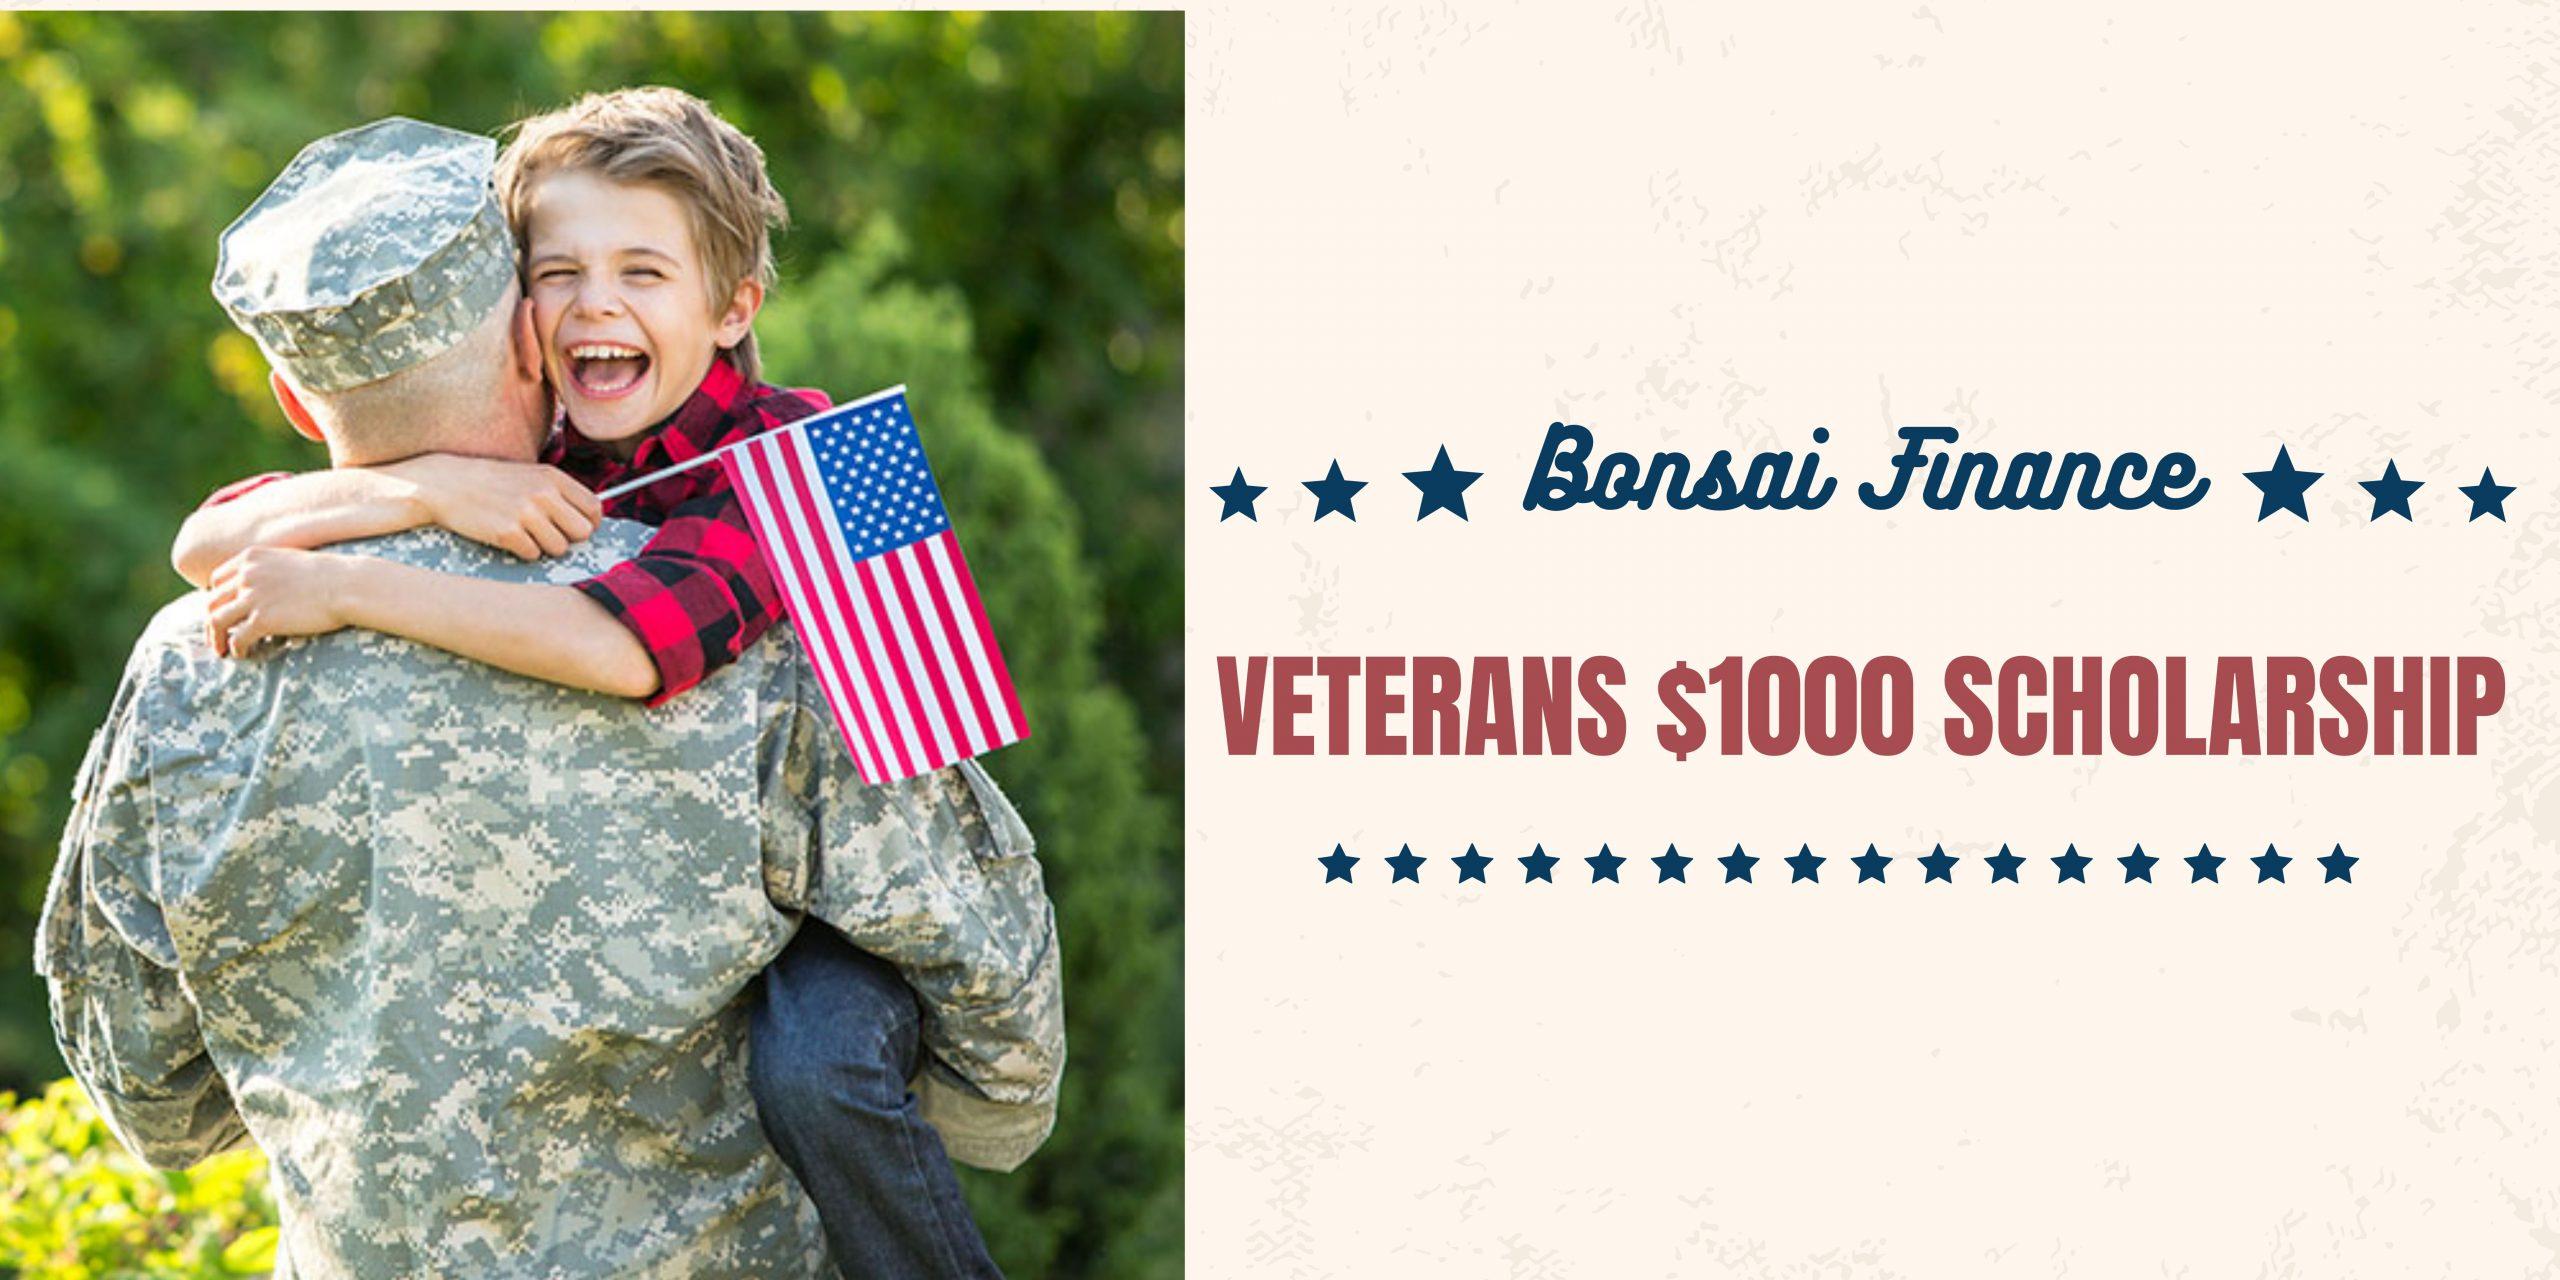 Bonsai Finance Veterans $1000 Scholarship